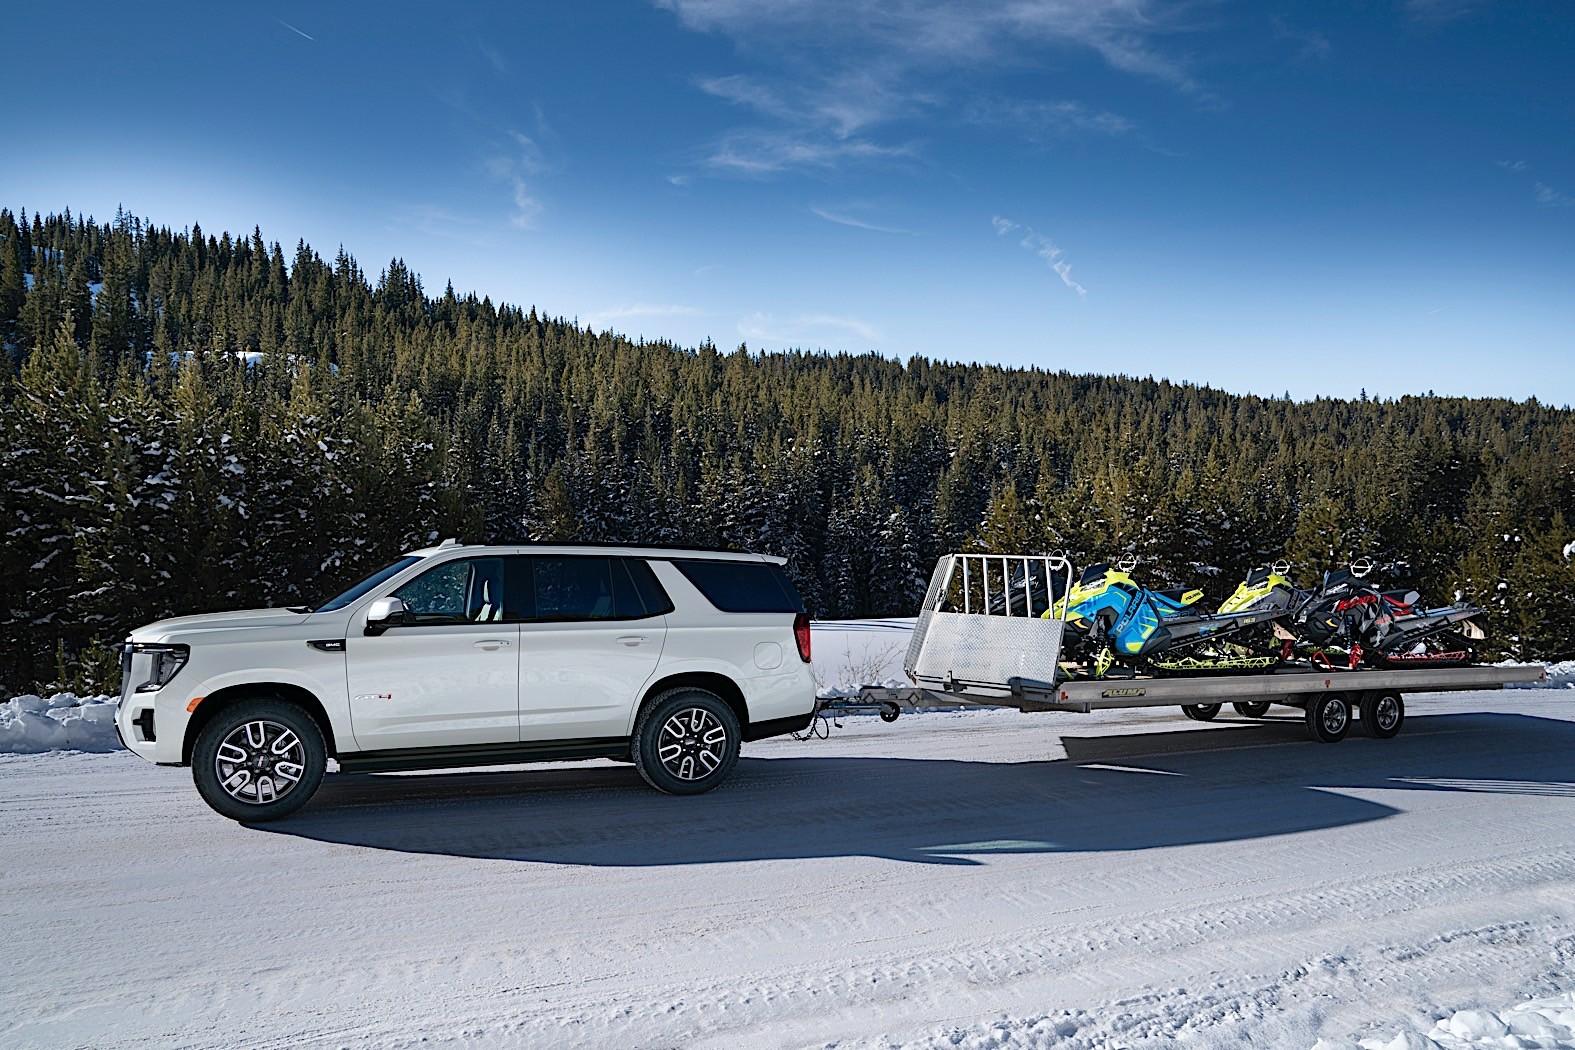 2021 Gmc Yukon Starting Price Confirmed Prepare 51 995 Autoevolution